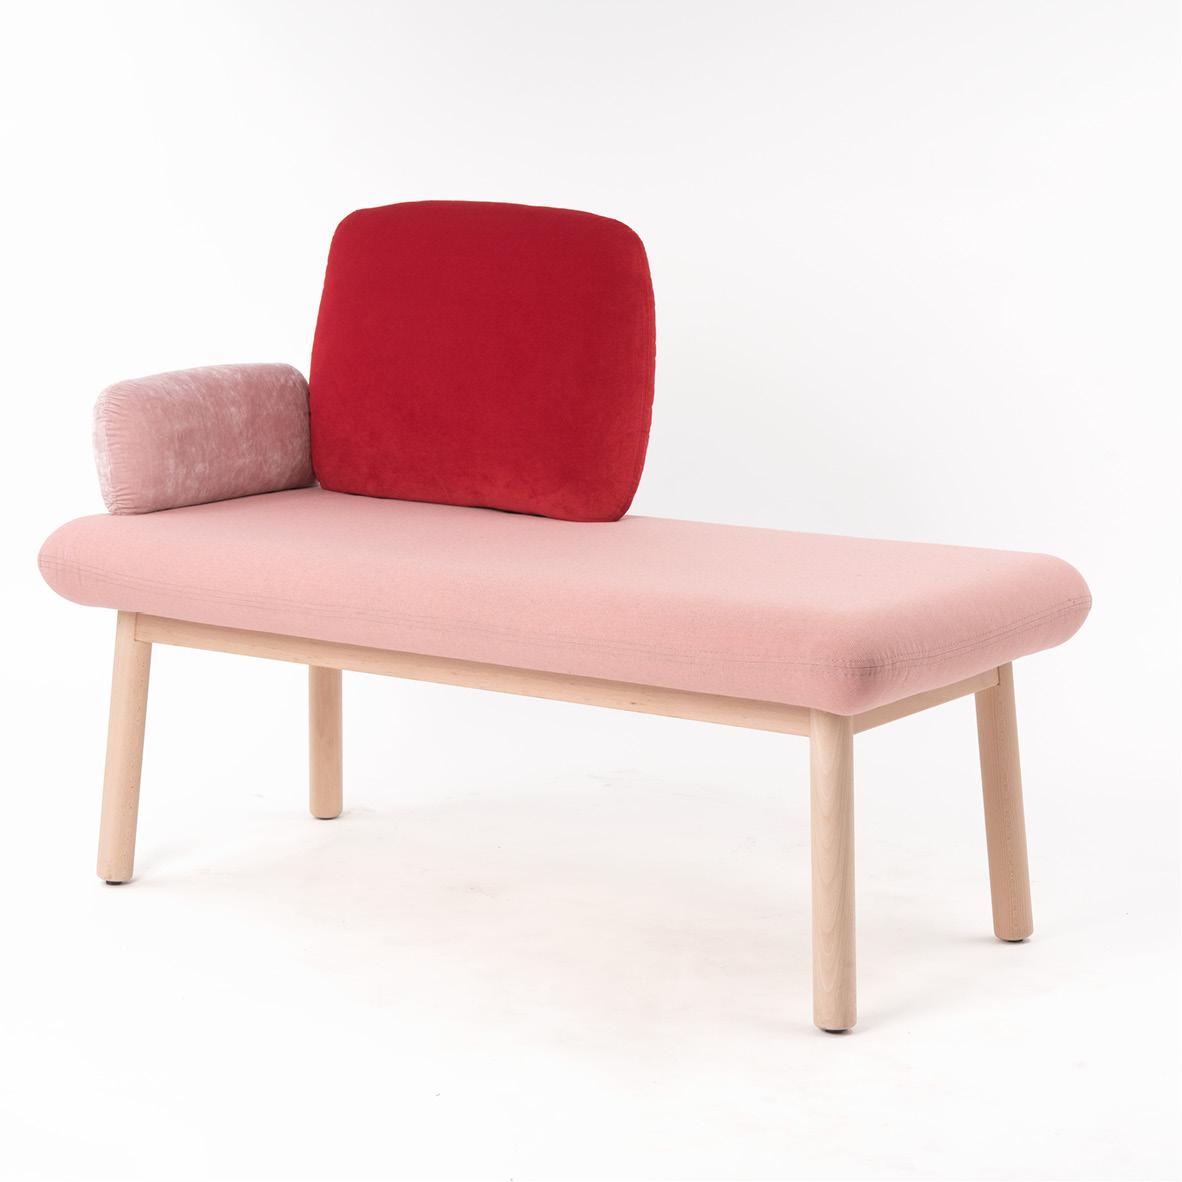 Sofa-Bank 40797, 2-Sitzer